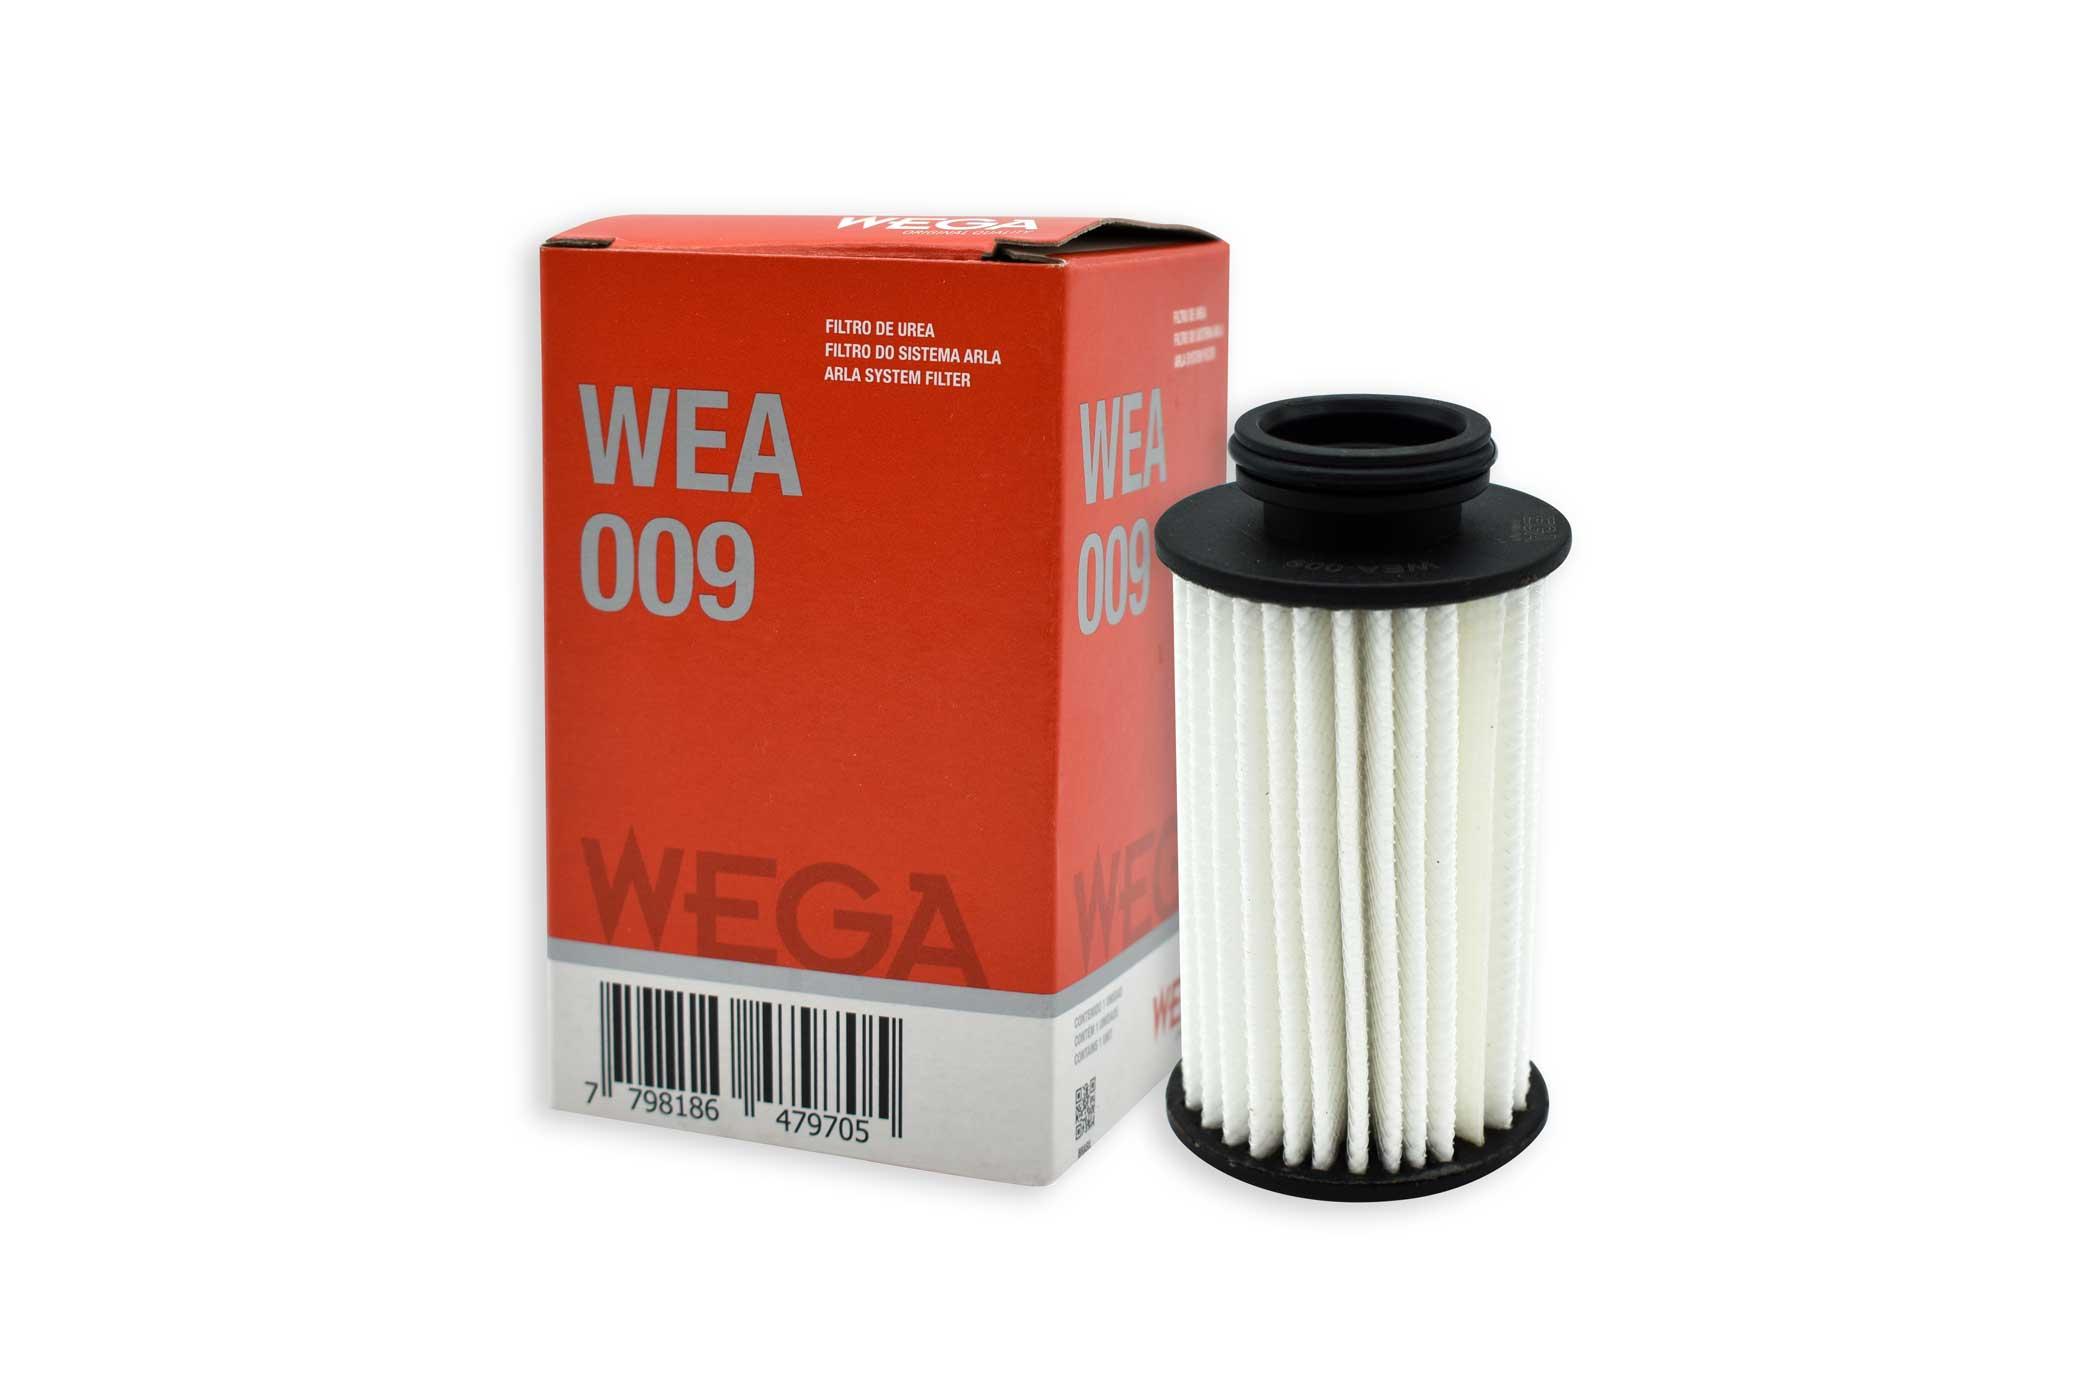 Código: WEA-009